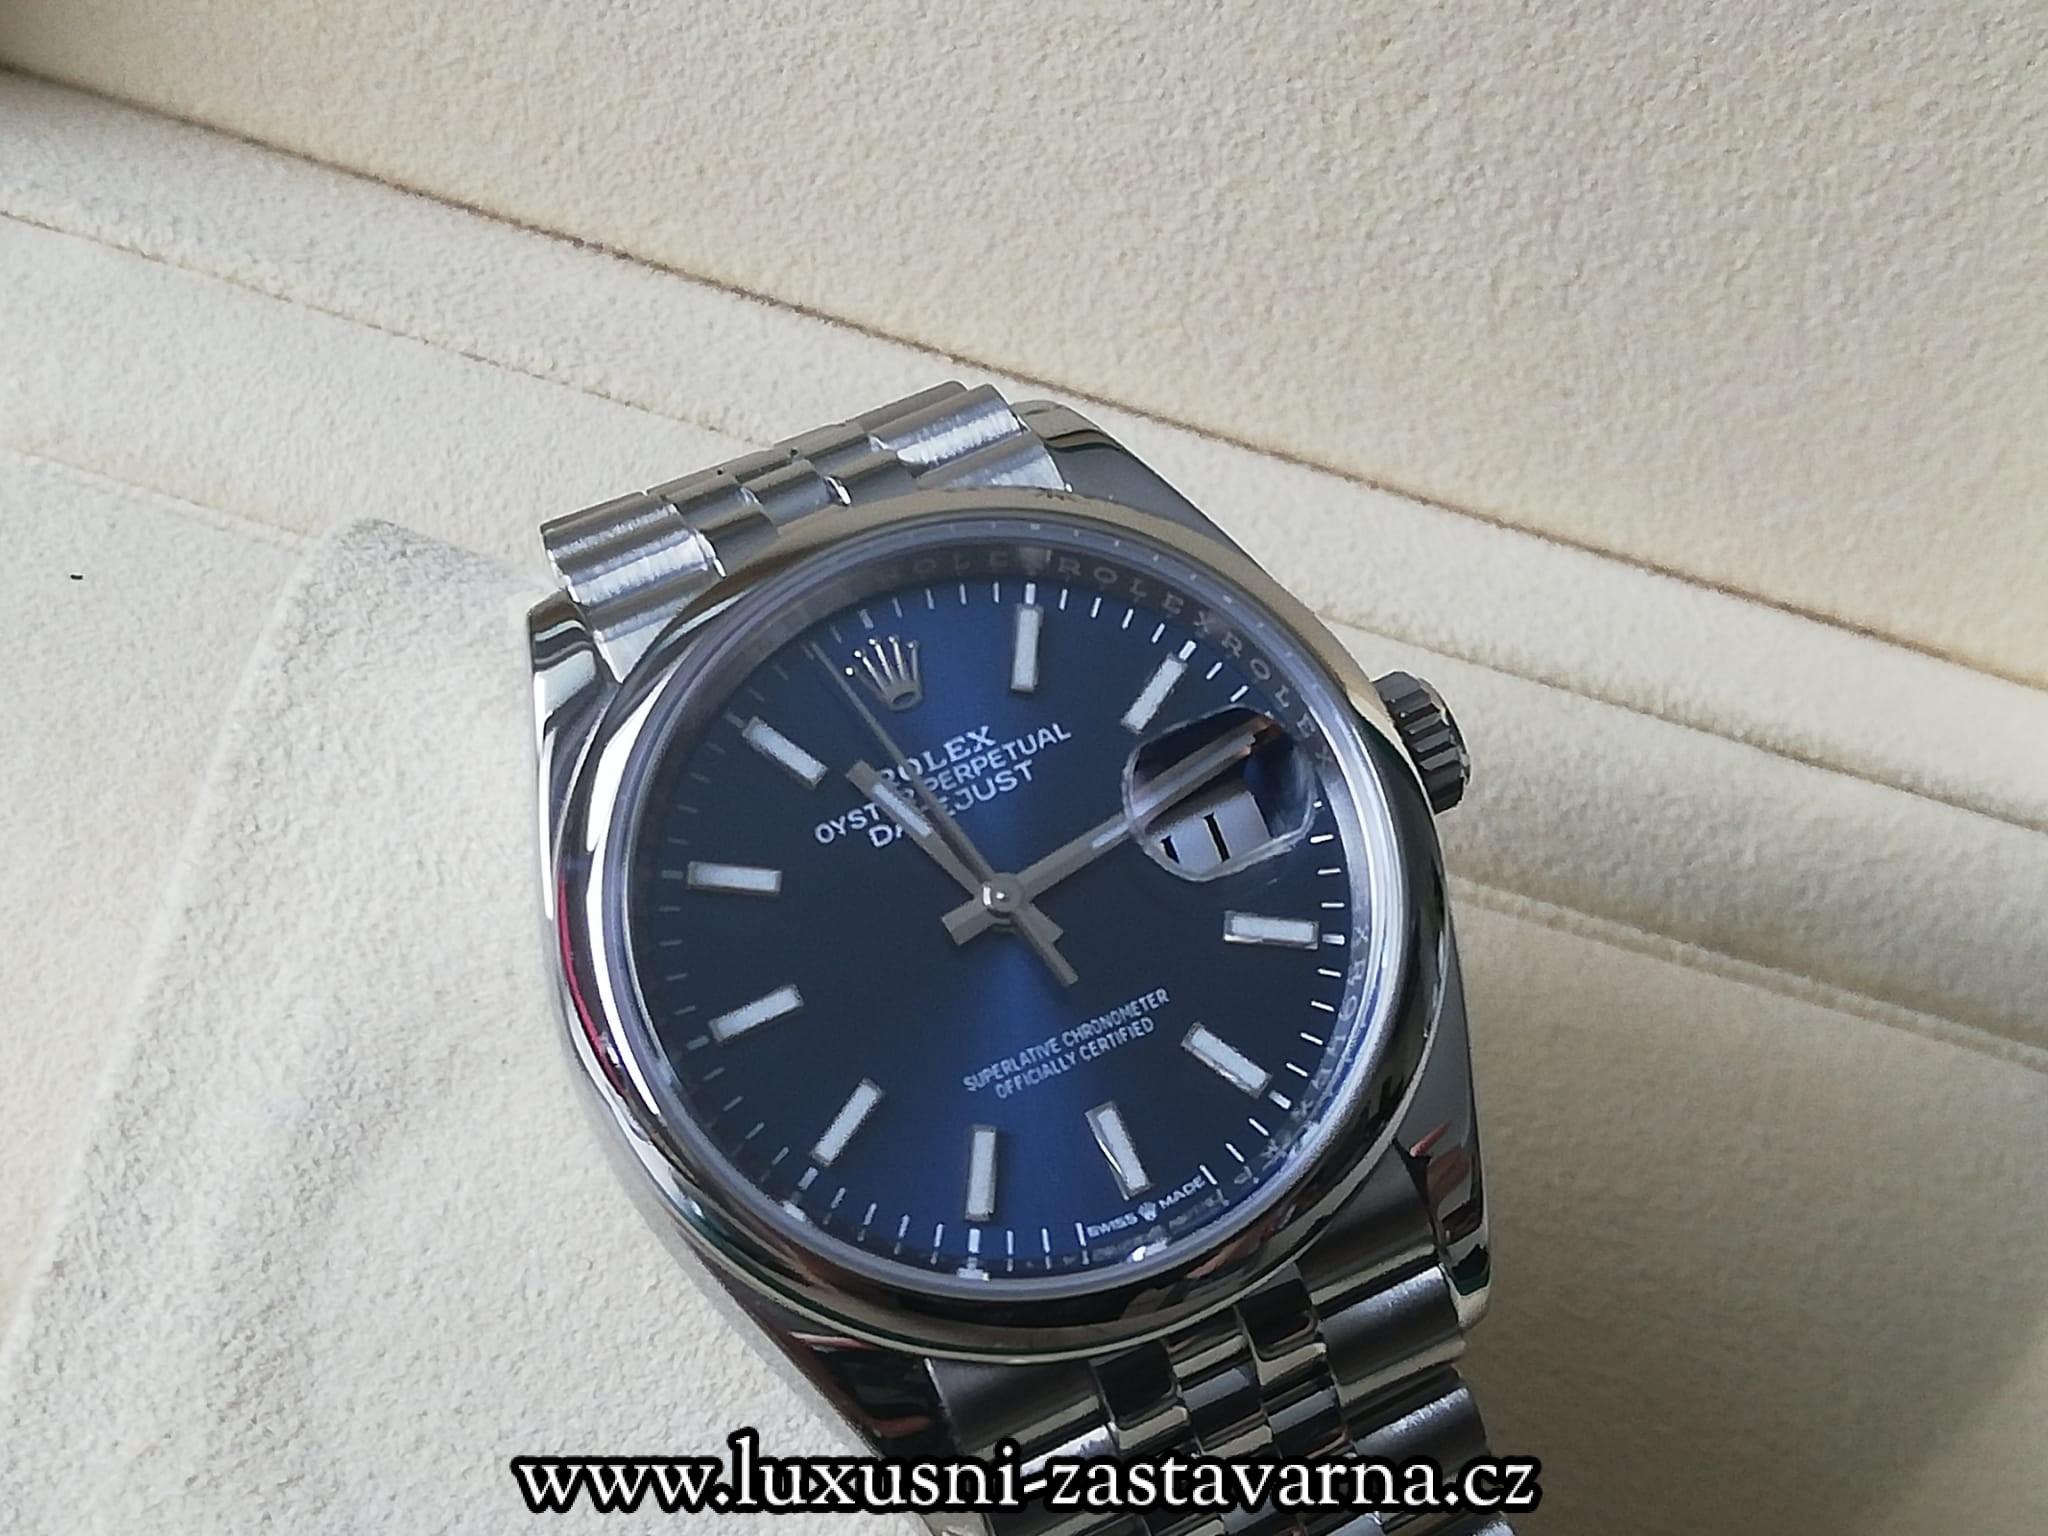 Rolex_Datejust_Blue_Dial_36mm_04